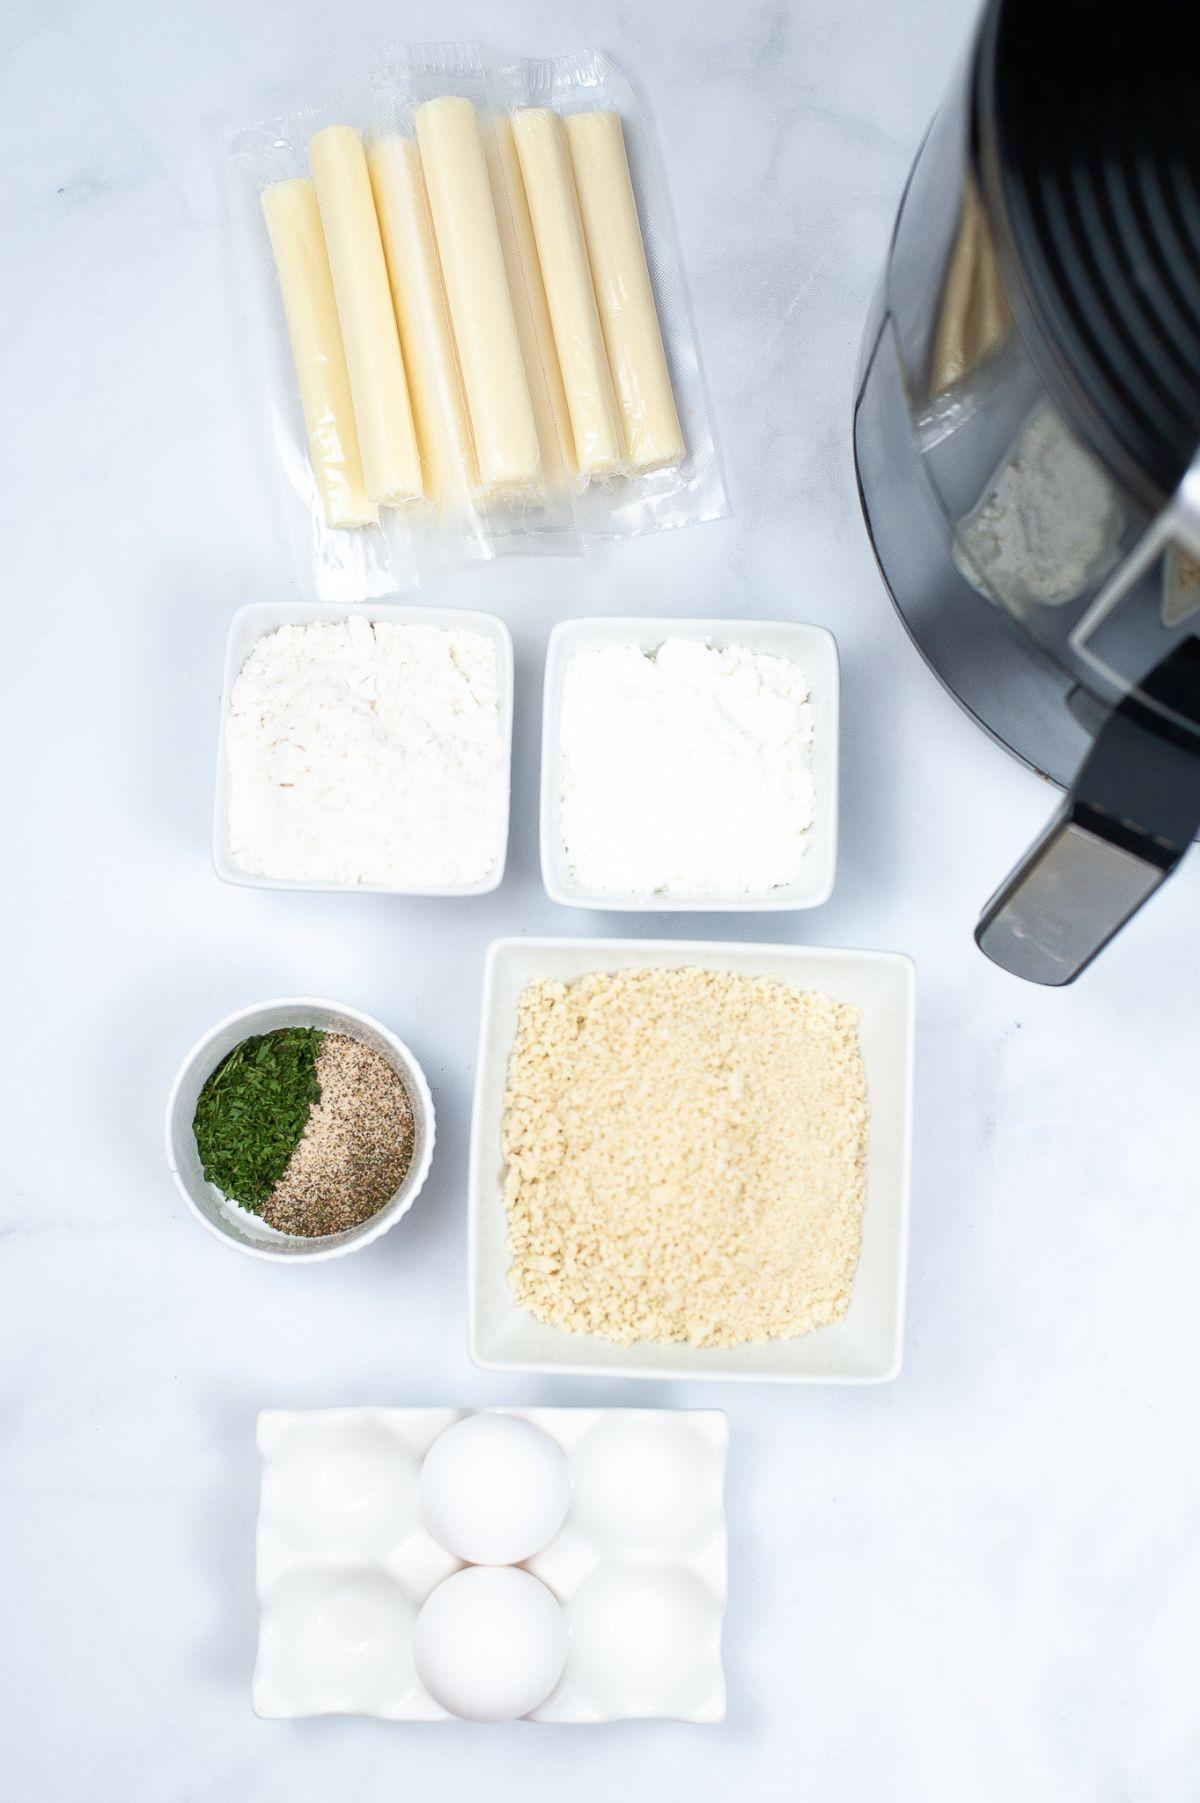 Air Fryer Mozzarella Sticks ingredients in small bowls, mozzarella cheese sticks, cornstarch, flour, panko, and eggs.